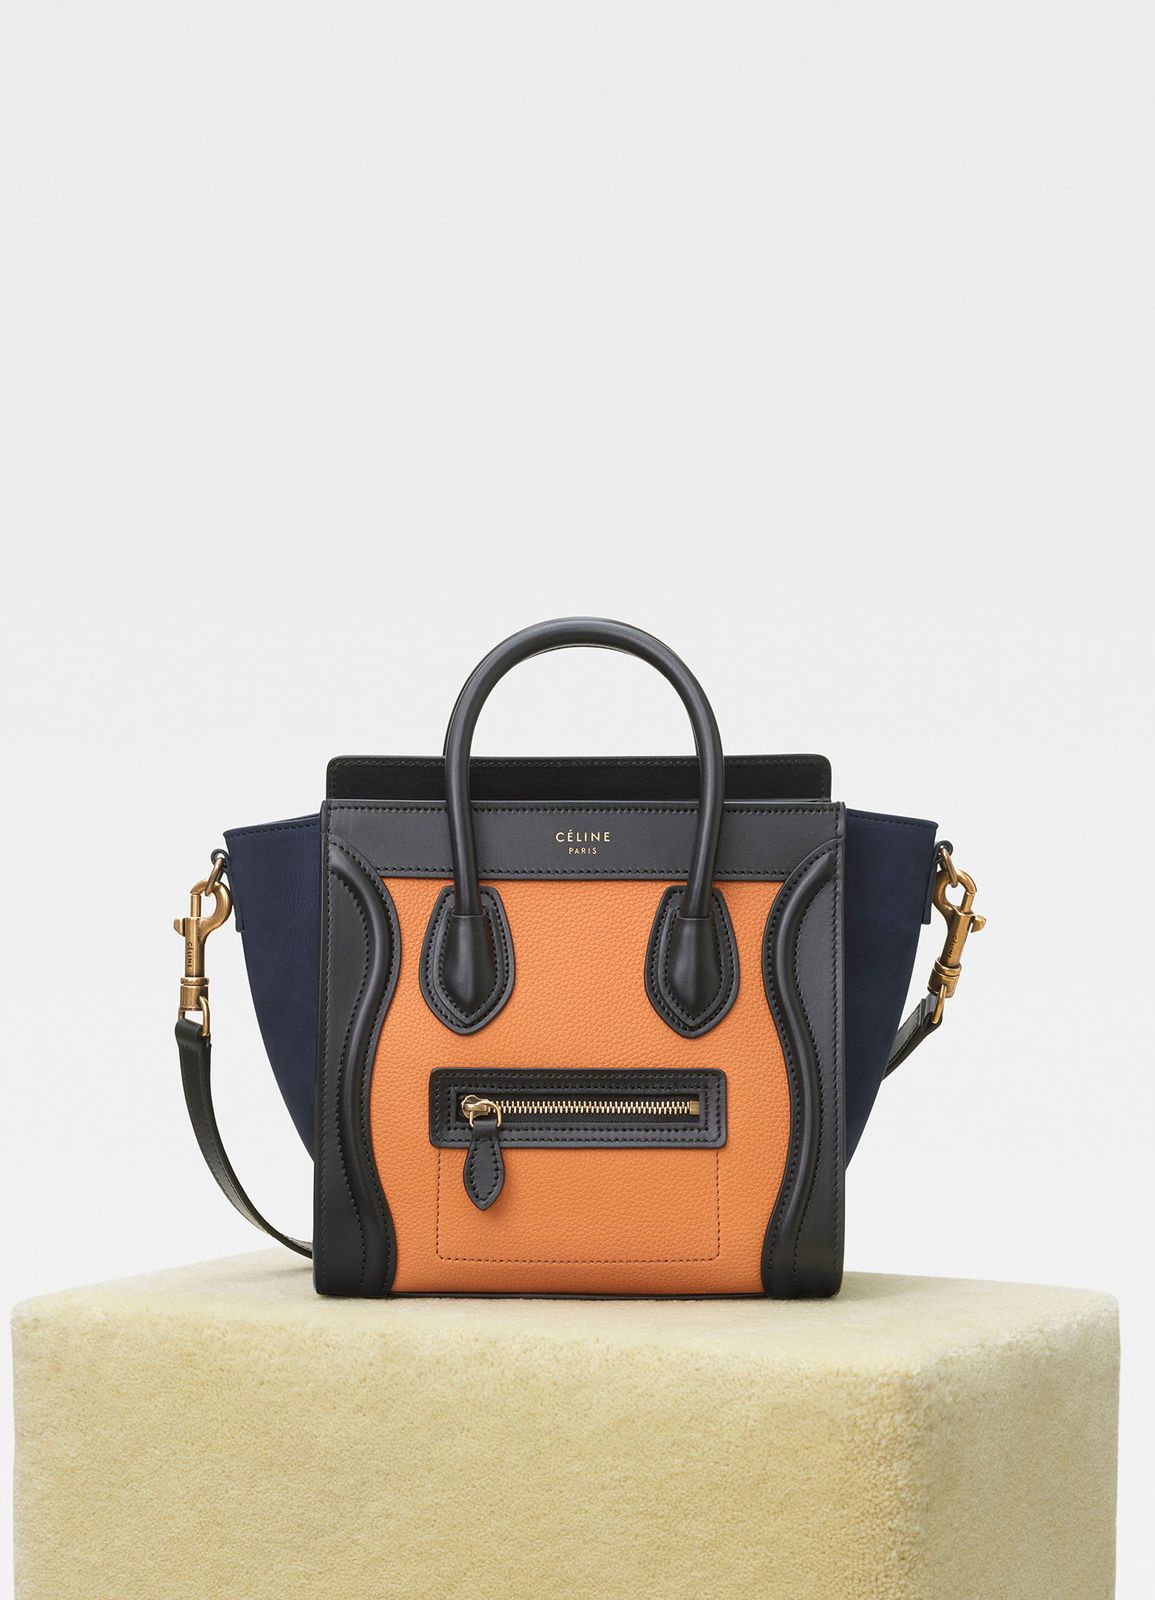 30a310aefa Nano Luggage bag in multicolour baby grained calfskin